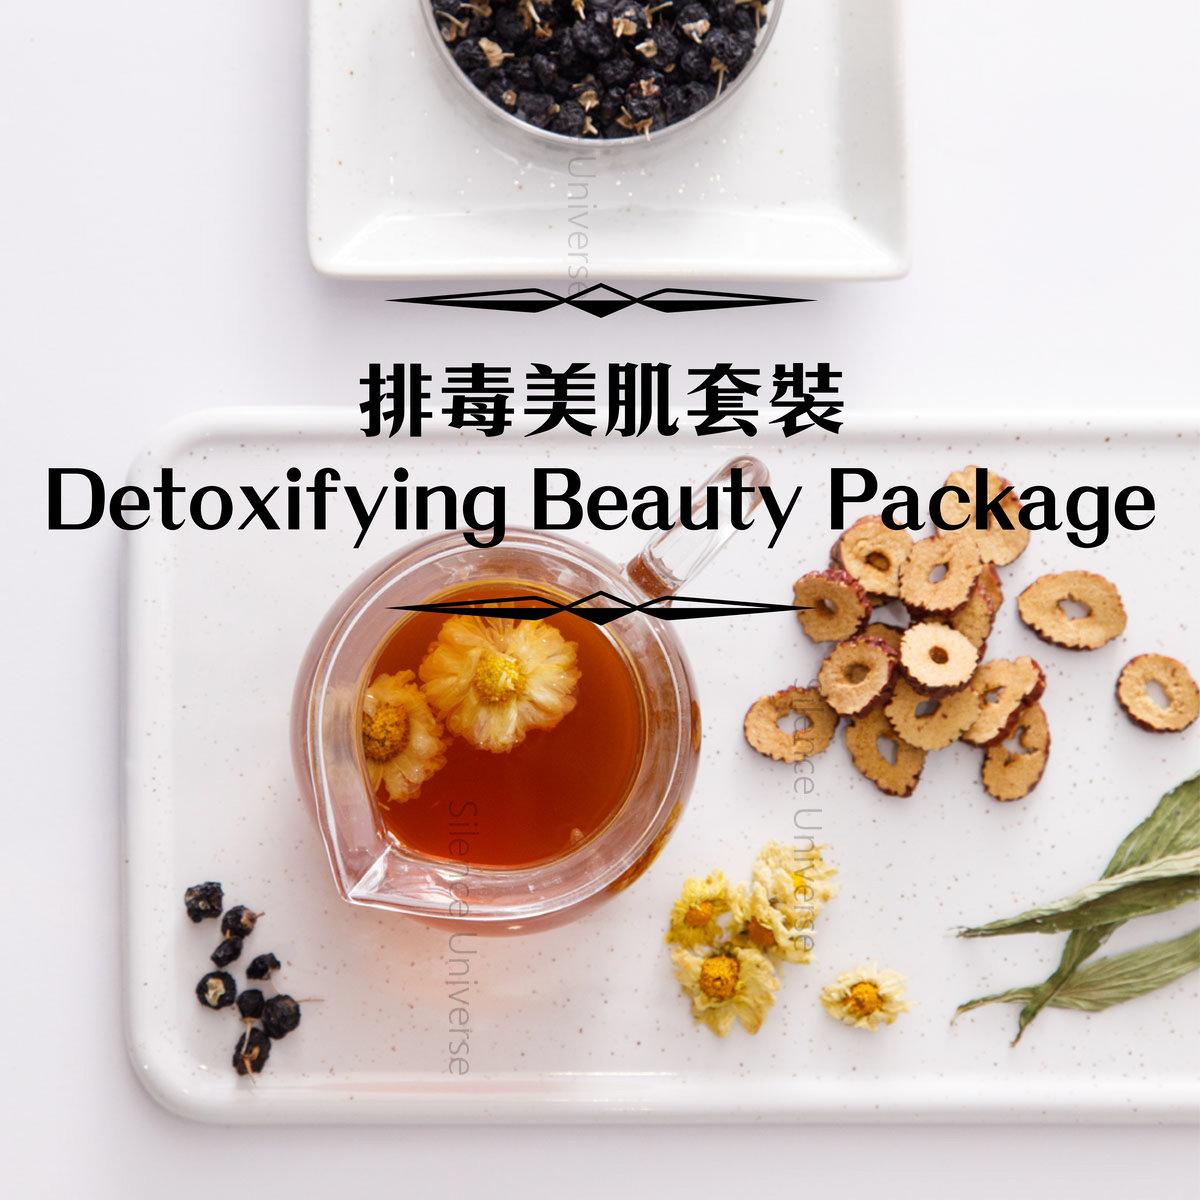 Detoxifying Beauty Package (x6 packs)